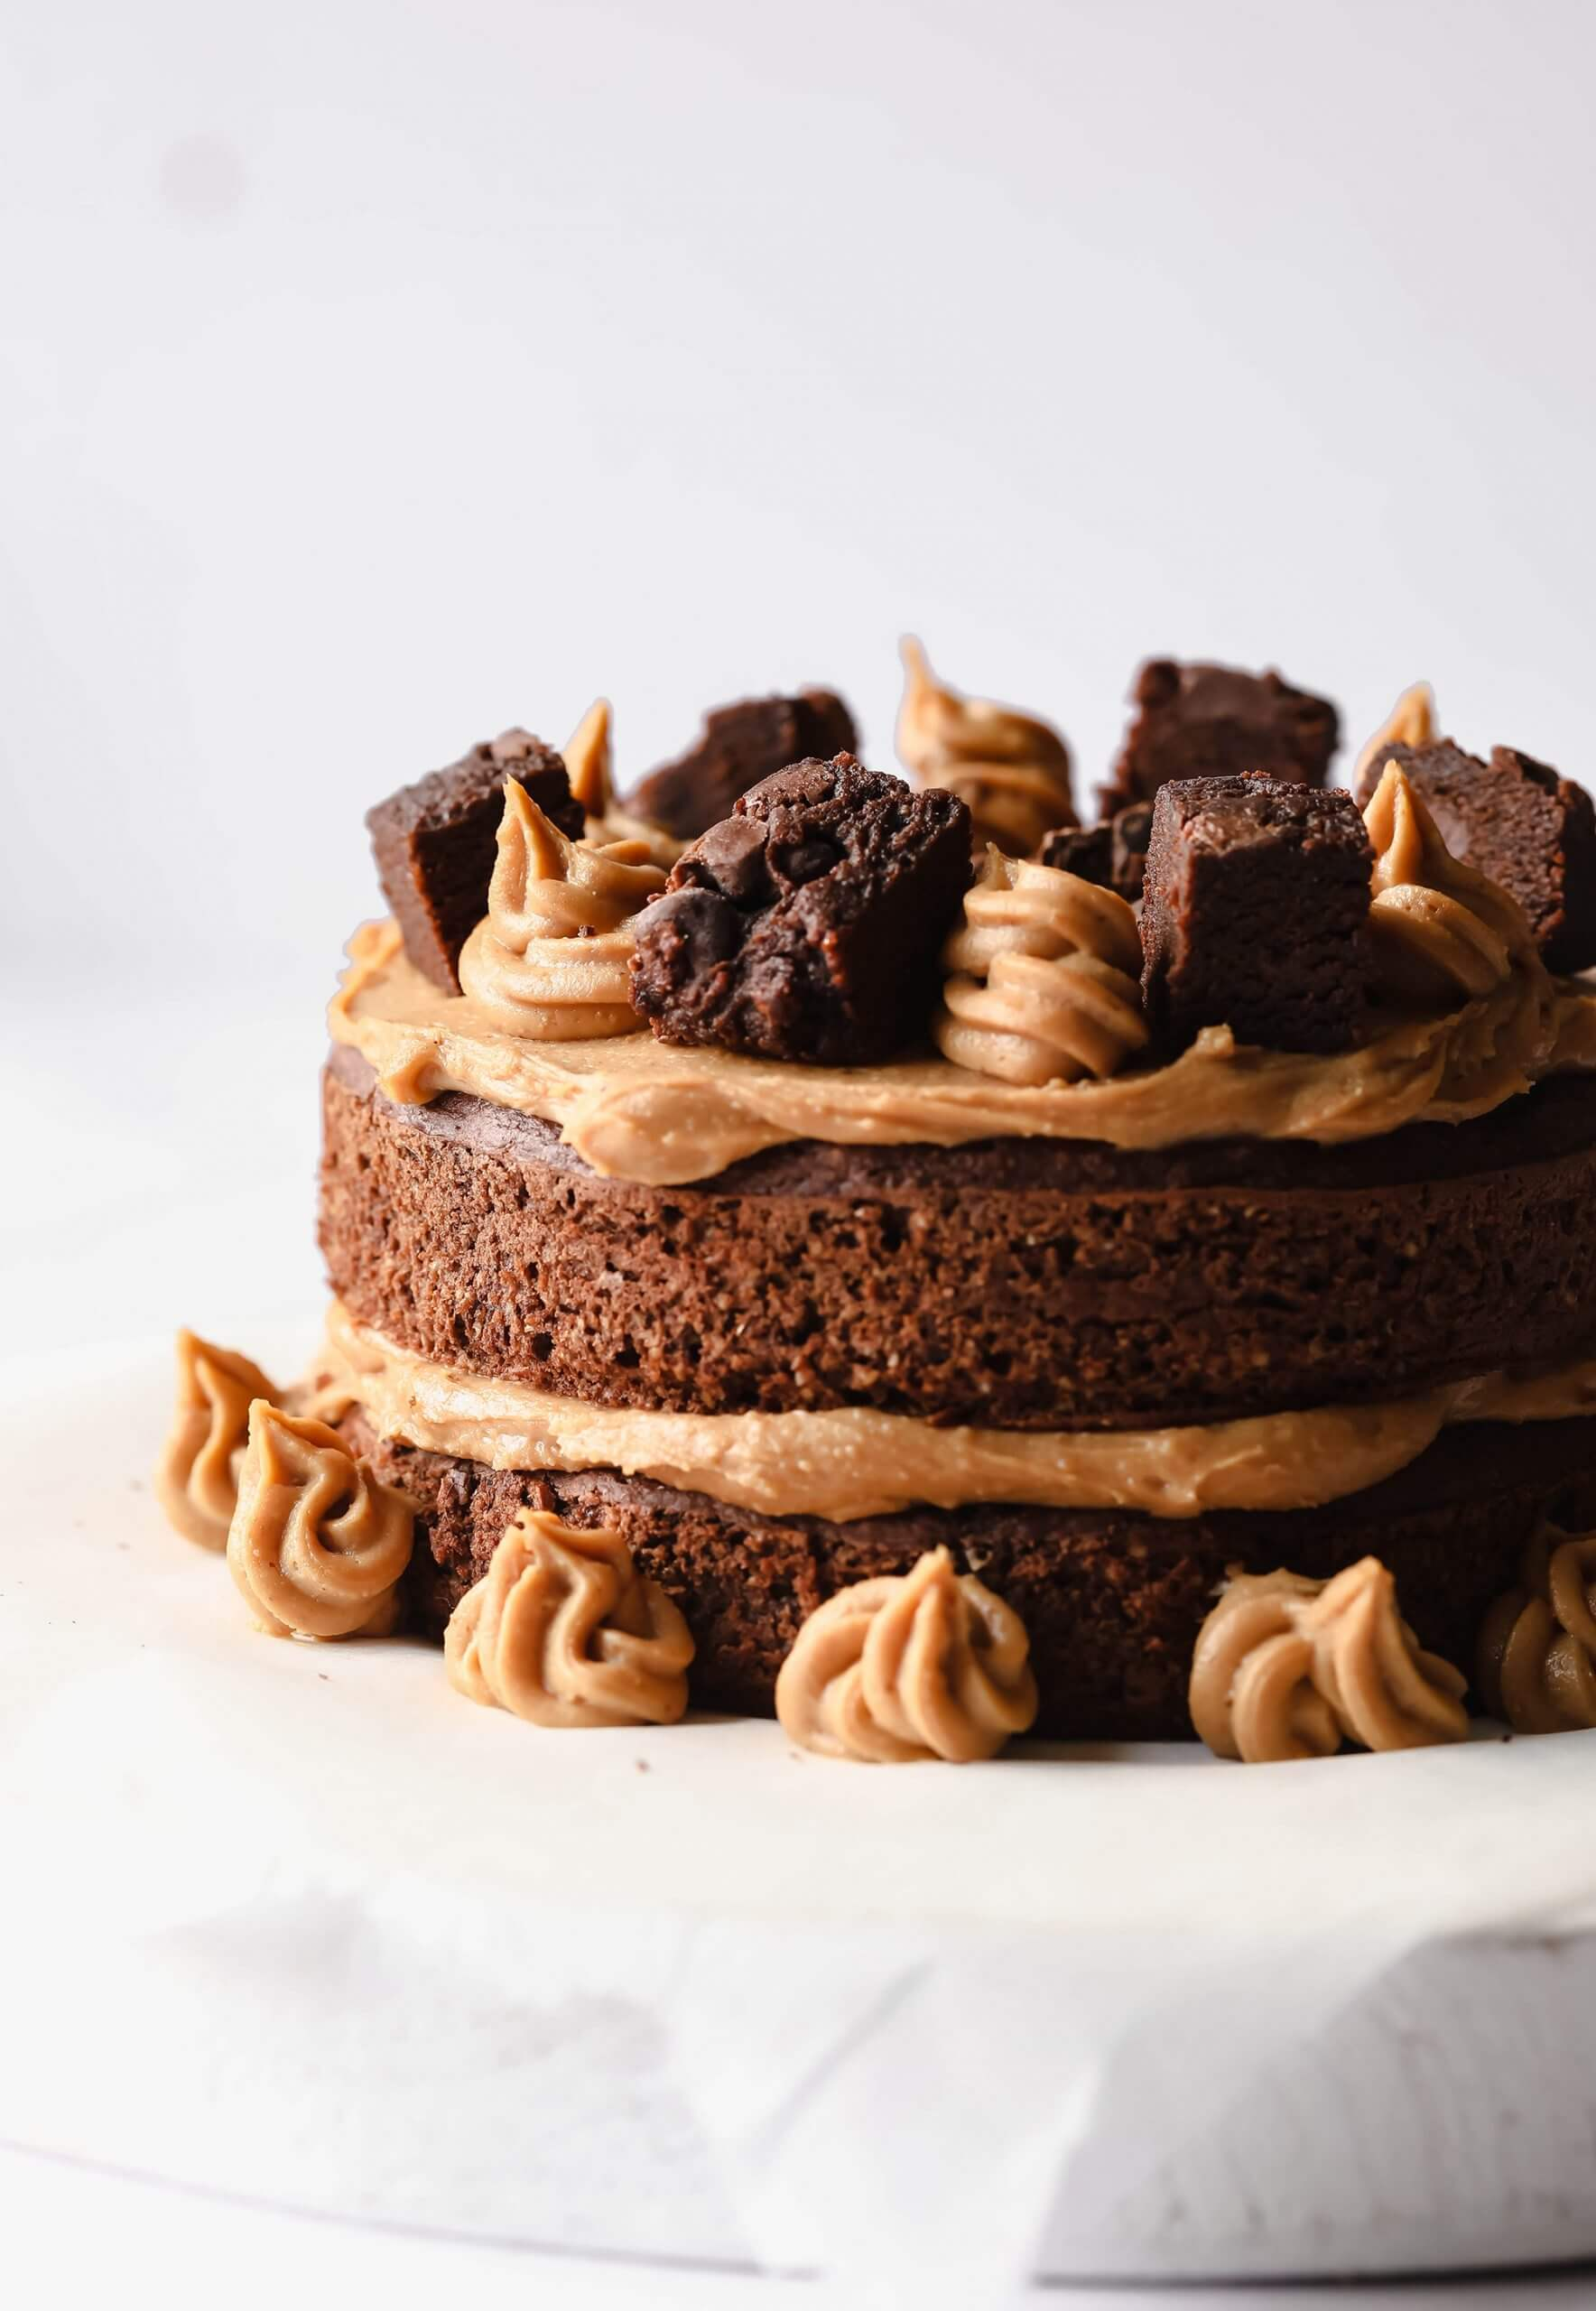 Healthier Chocolate Peanut Butter Cake